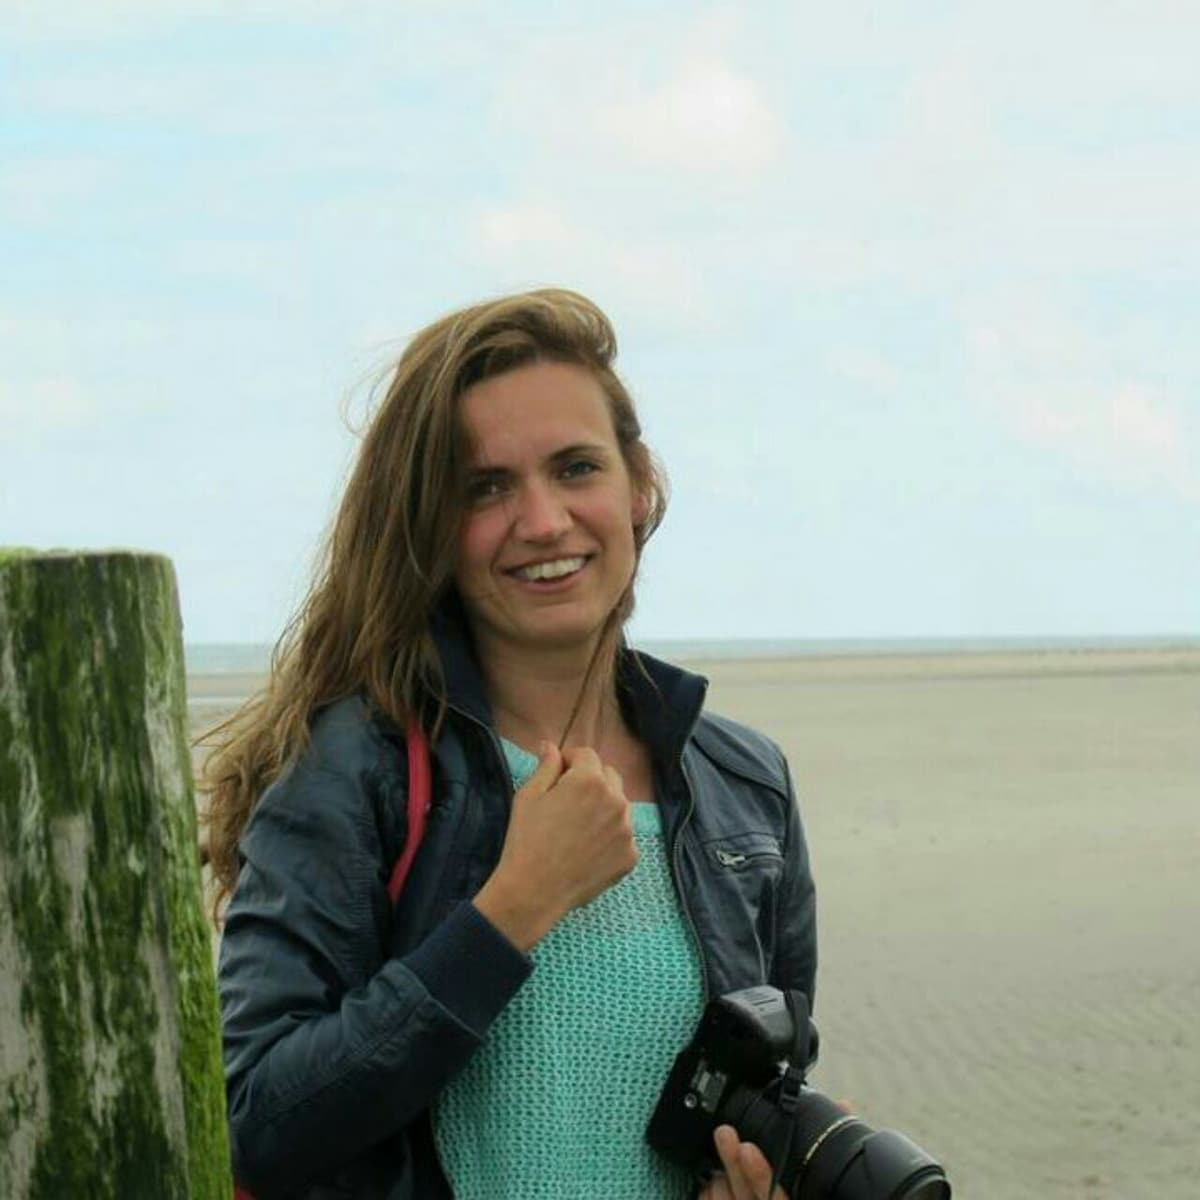 Katalin from Almelo